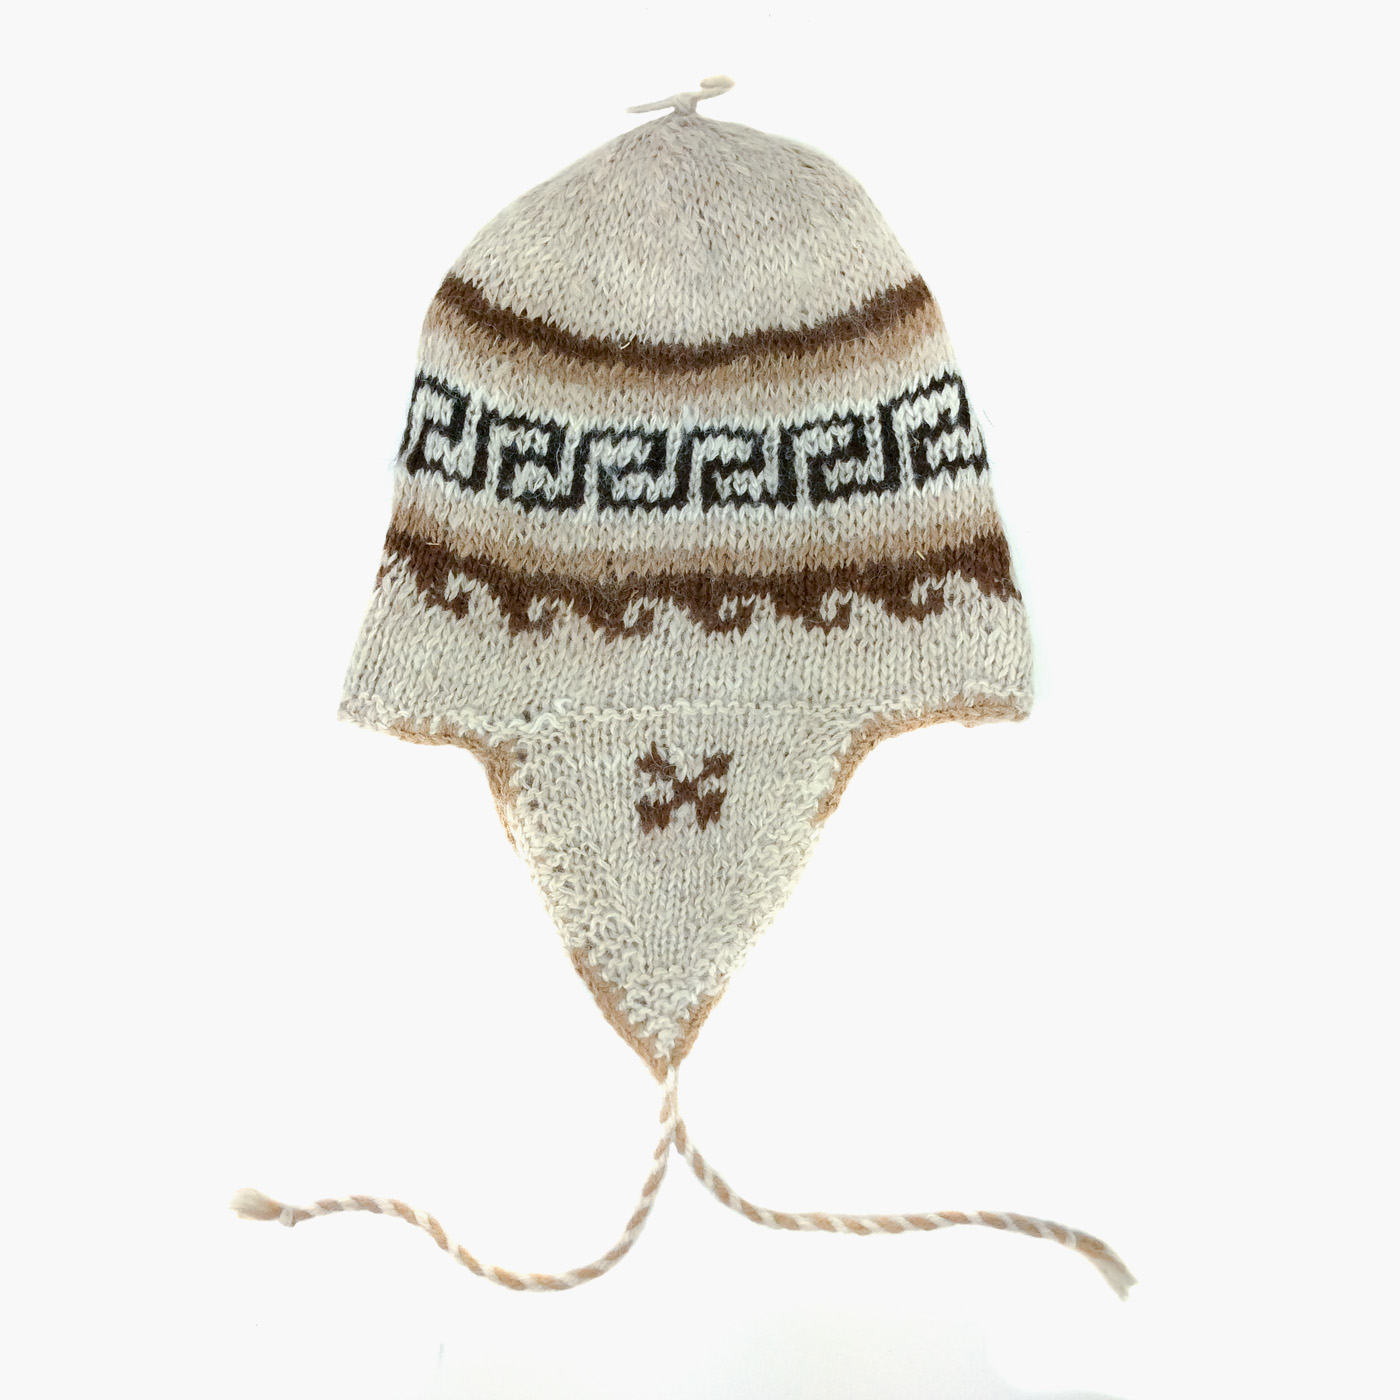 718de1842d6 White 100% Alpaca Wool Hand Knitted Peruvian Hat